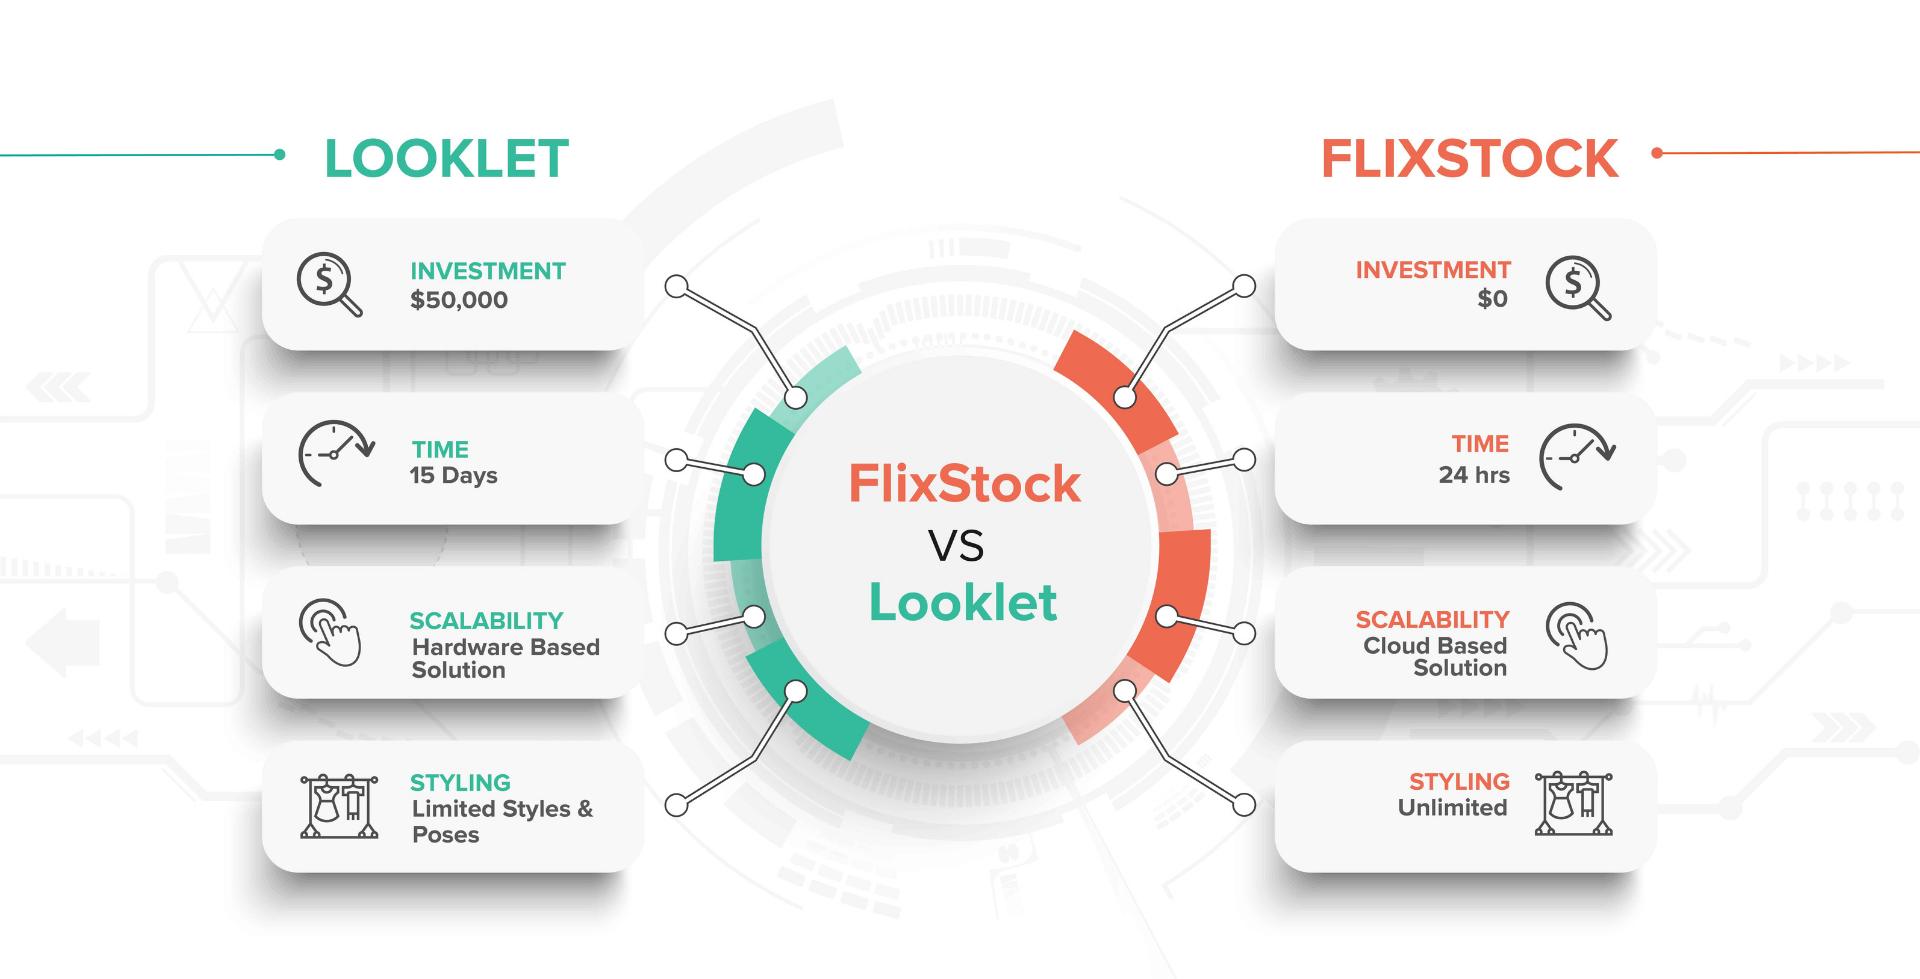 Looklet vs FlixStock